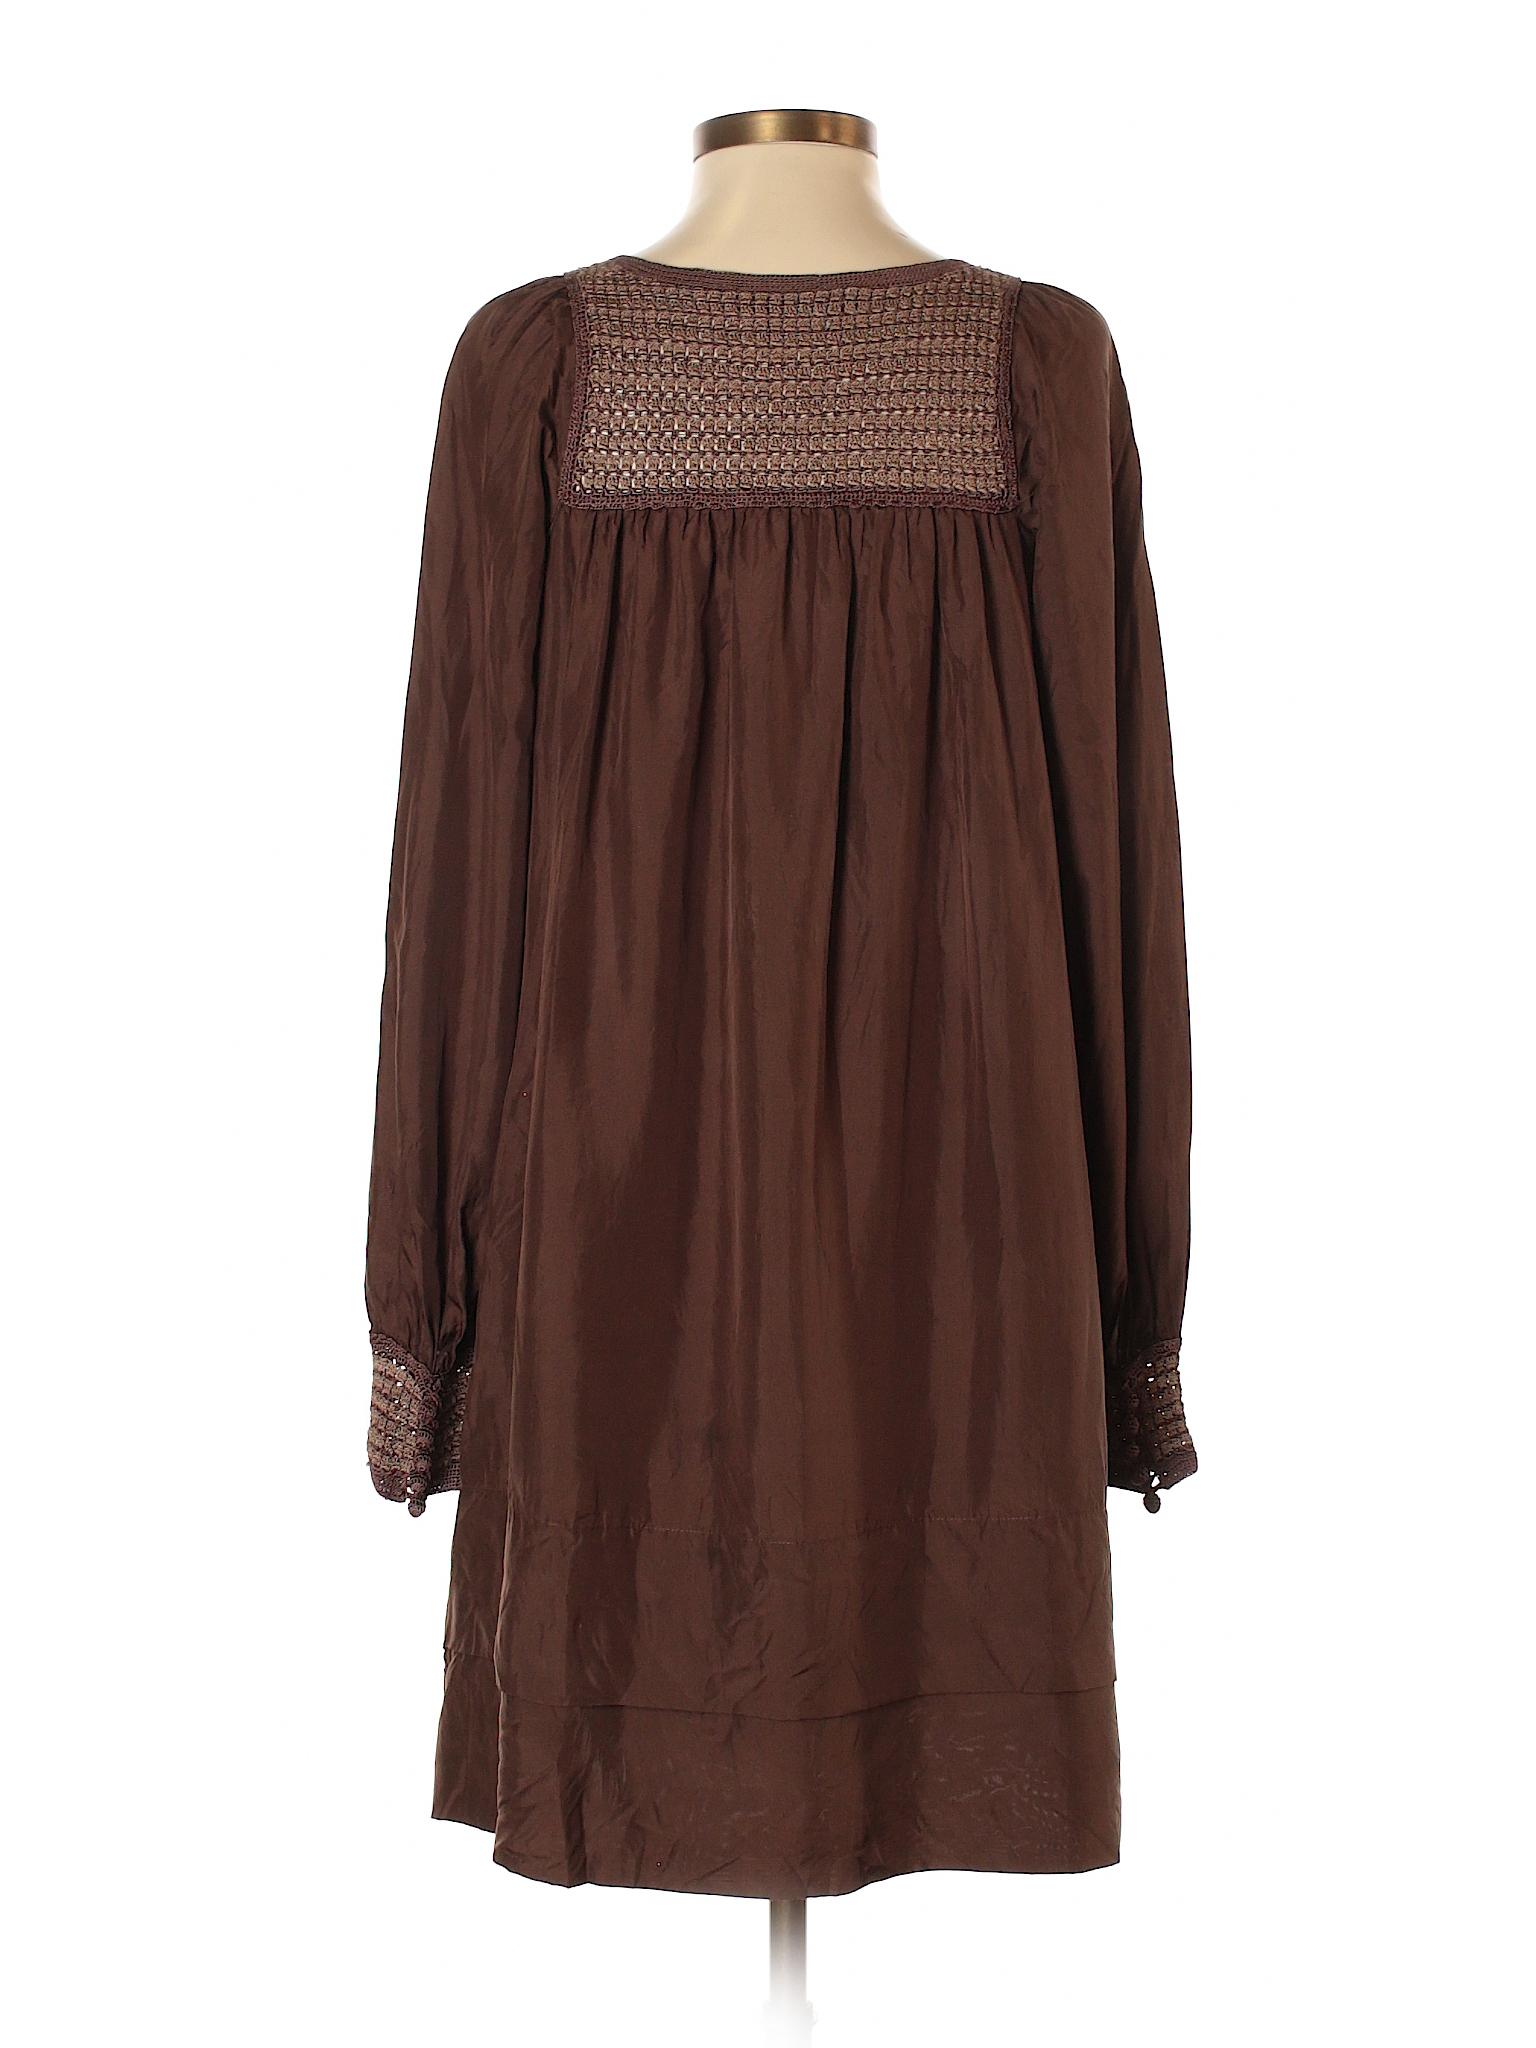 BCBGMAXAZRIA BCBGMAXAZRIA Dress BCBGMAXAZRIA Dress Casual Casual winter Boutique winter Boutique Casual Boutique Dress winter ZIwSq